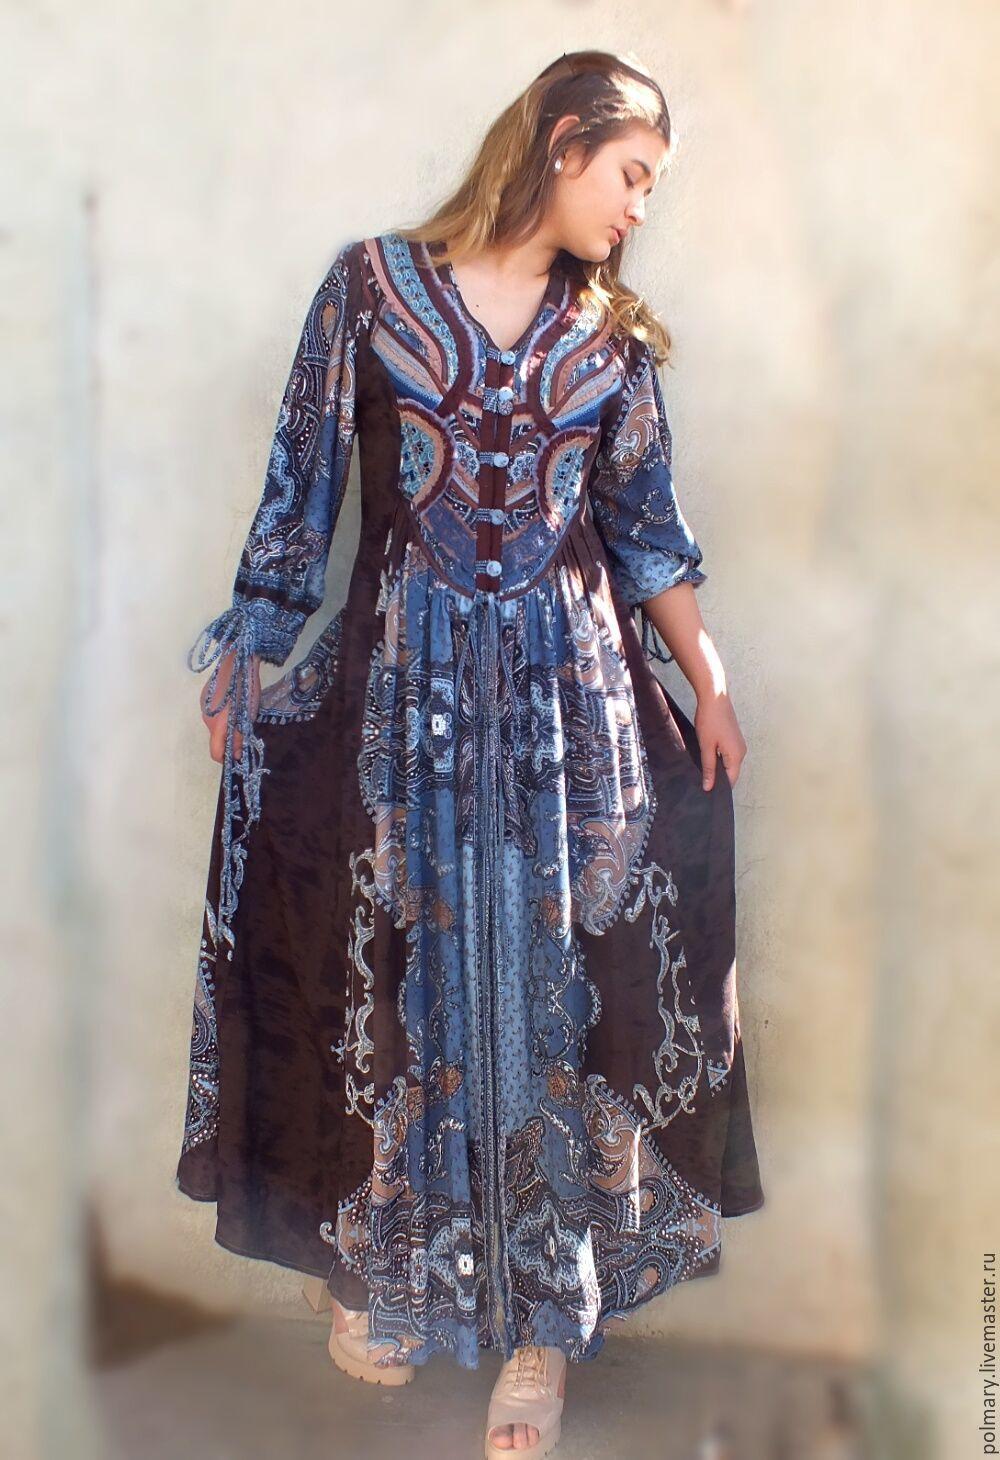 933dd22899f Dresses handmade. Boho dress-chocolate-blue  butterfly Wings . PolMary.